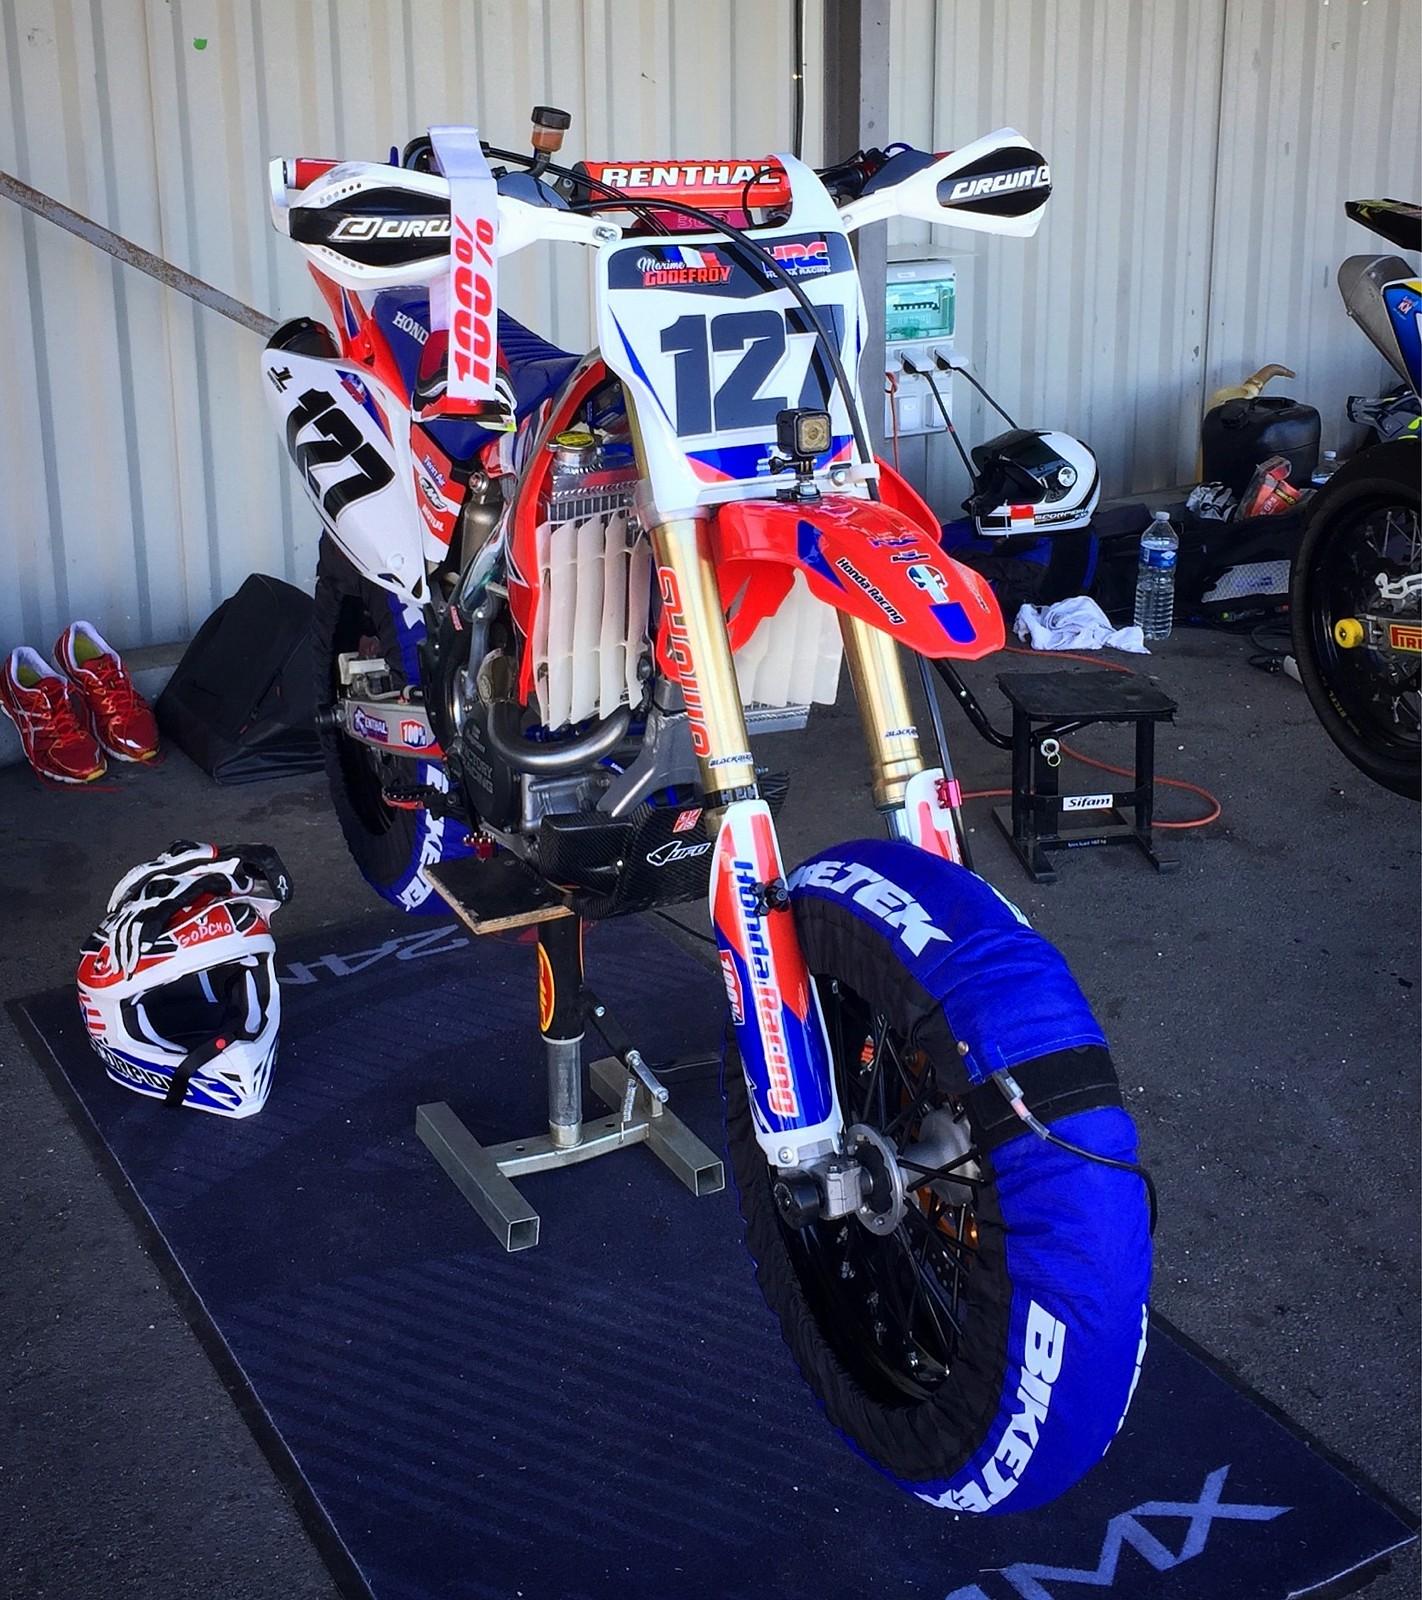 875D718C-3A24-42FD-AE50-7F7F58D60E8B - Godcho - Motocross Pictures - Vital MX